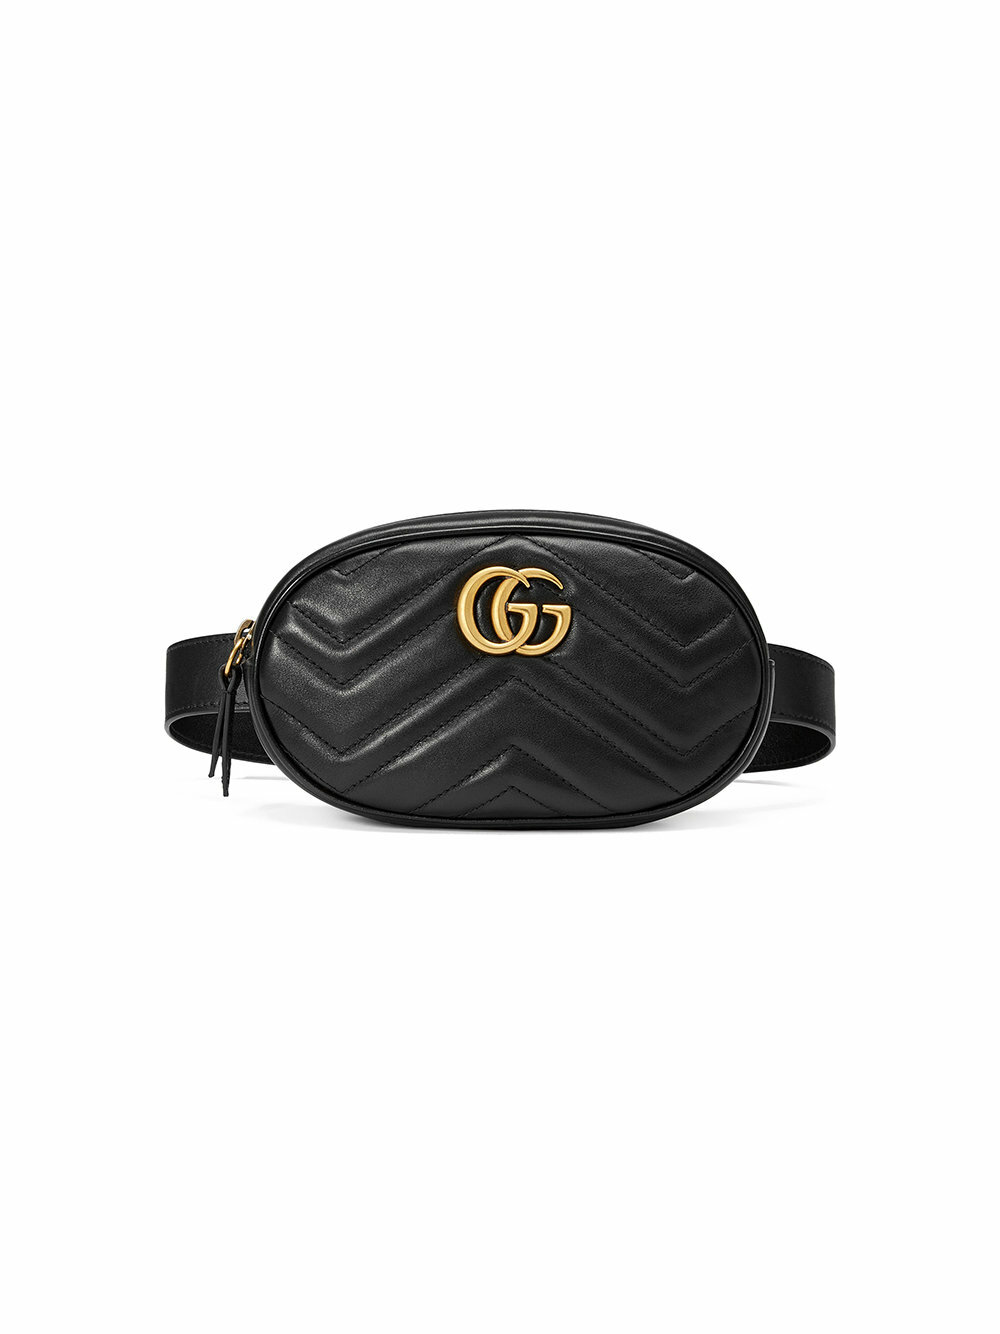 Поясная сумочка GG Marmont в Армавире